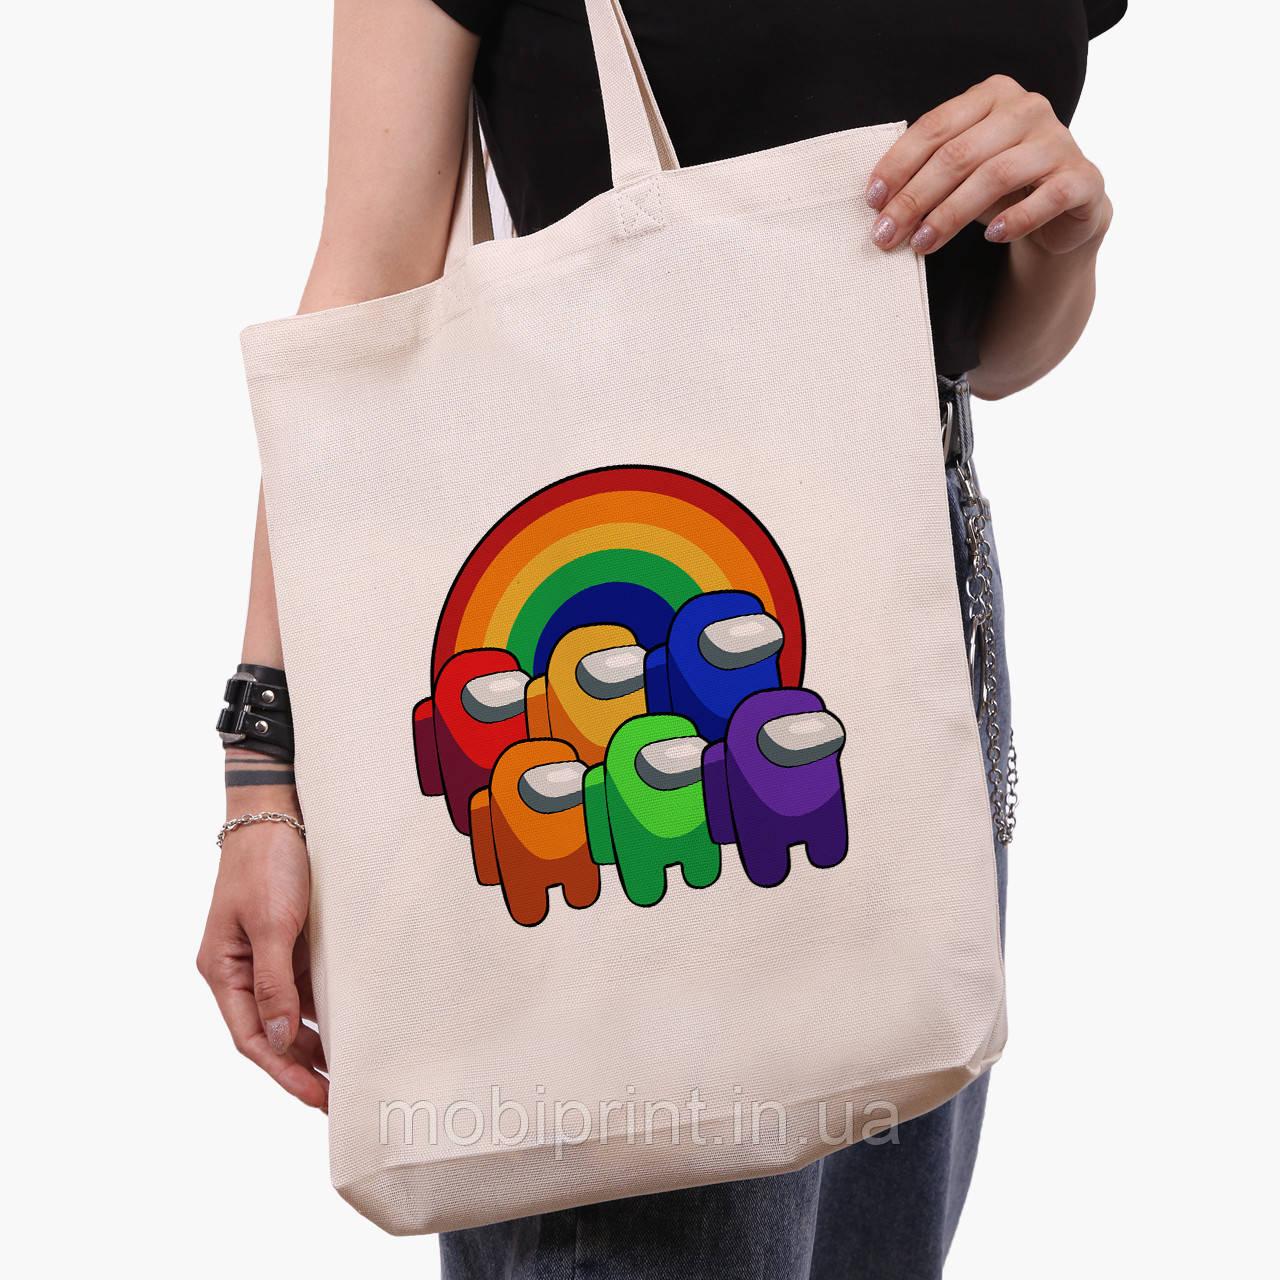 Еко сумка шоппер біла Амонг Ас (Among Us) (9227-2595-1) 41*39*8 см